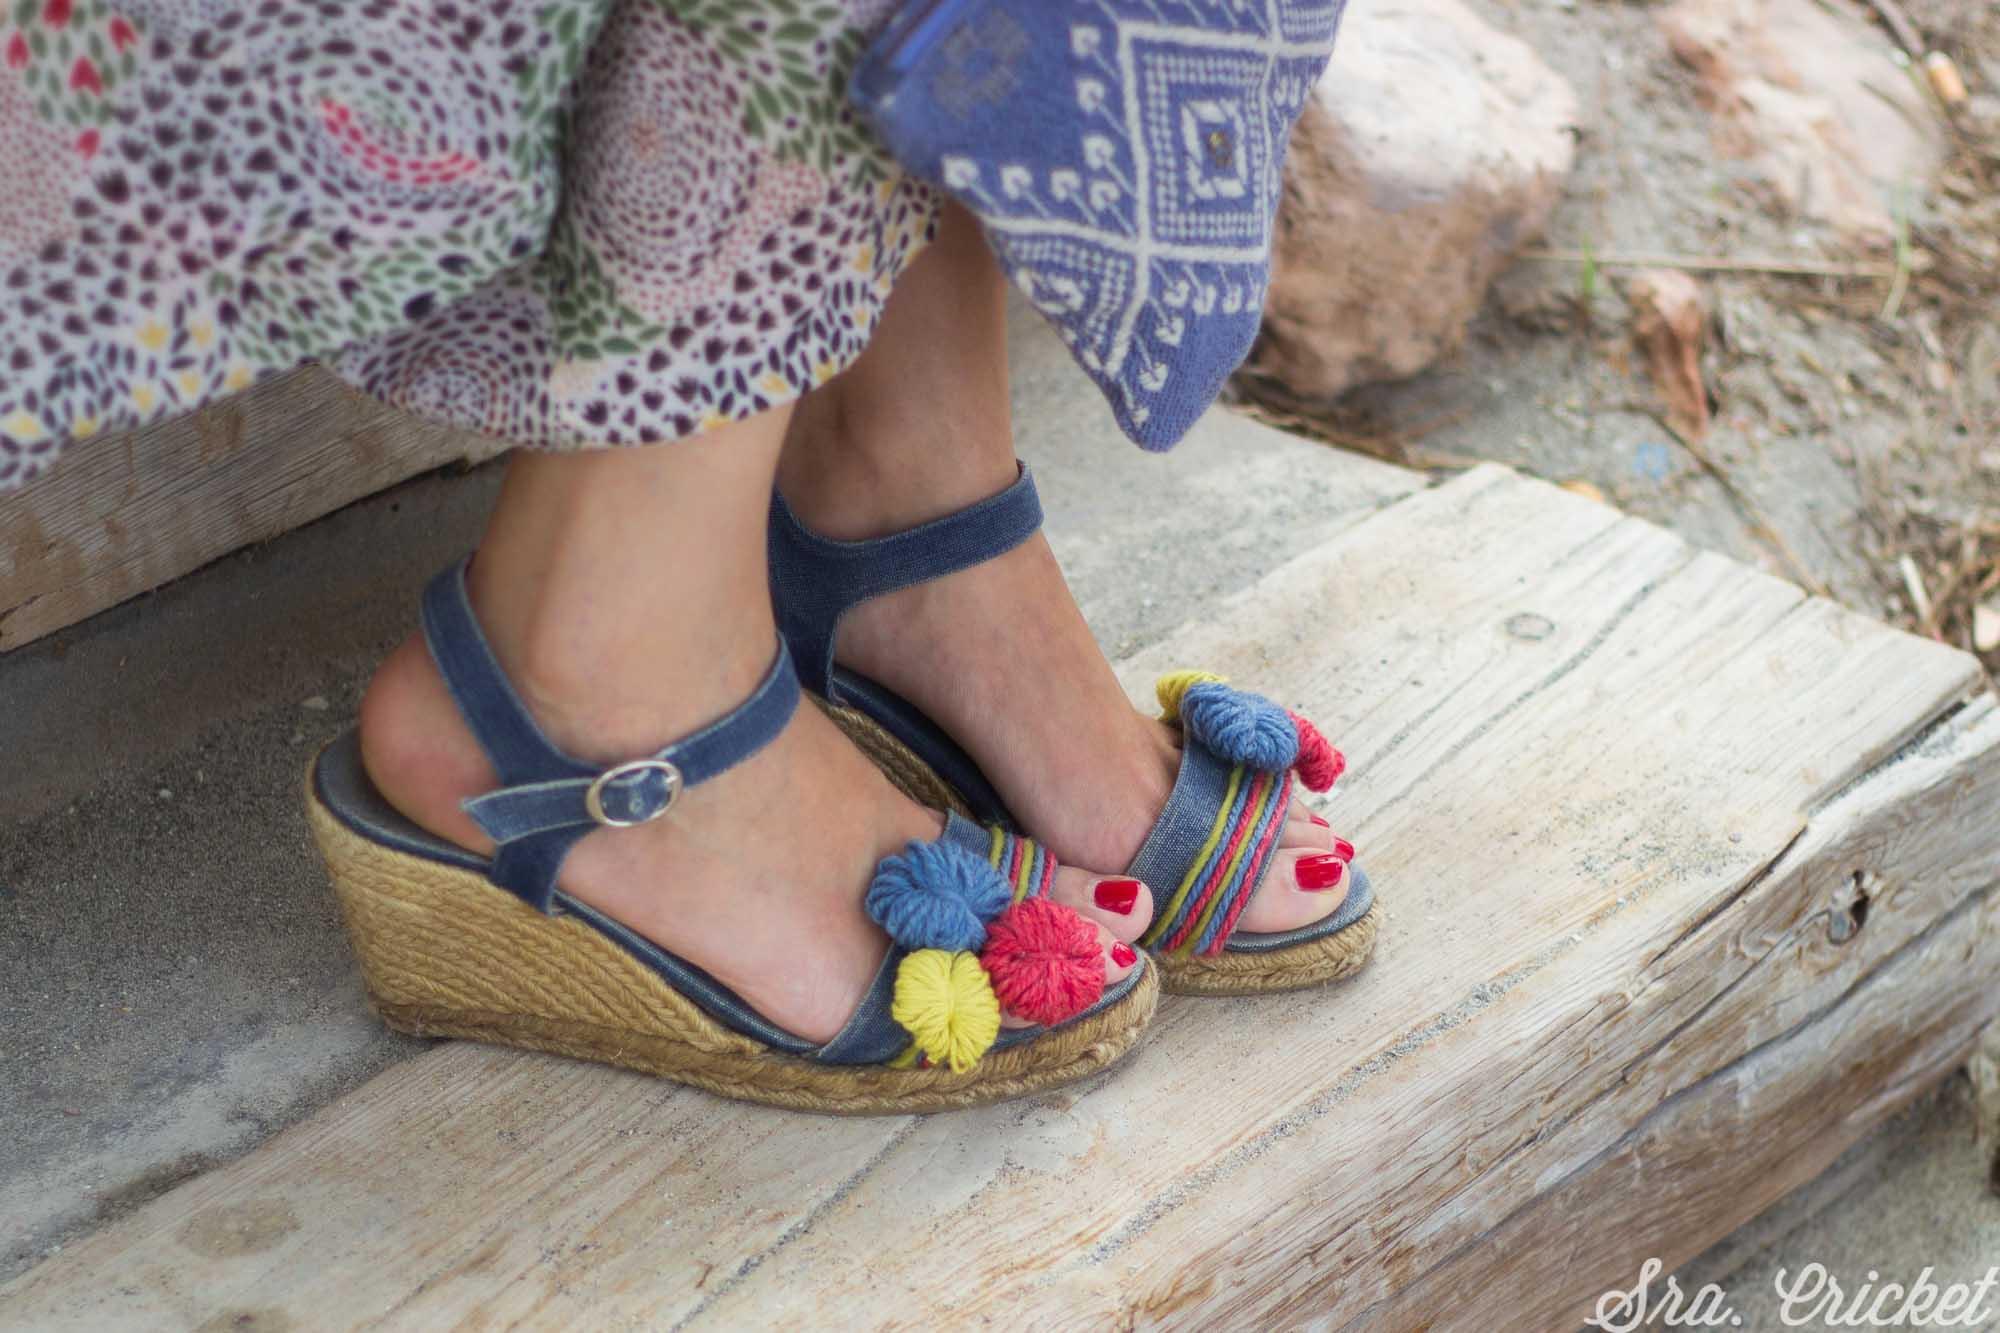 viejas sandalias de esparto personalizadas